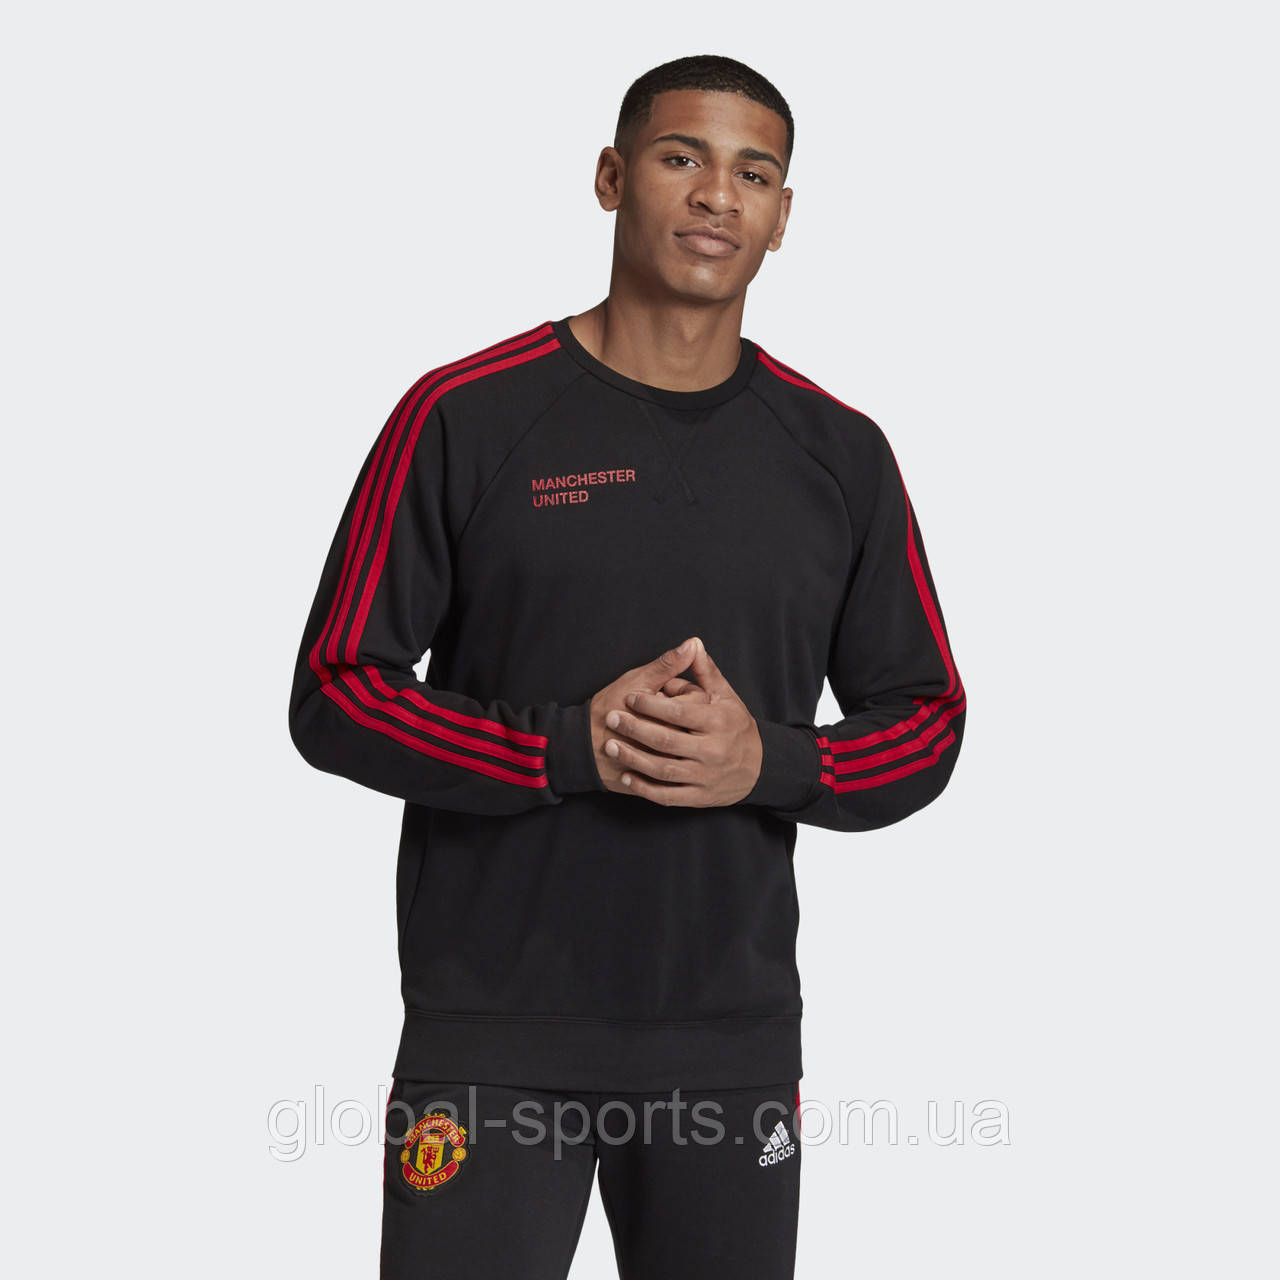 Чоловічий джемпер Adidas Manchester Graphic(Артикул:FR3841)